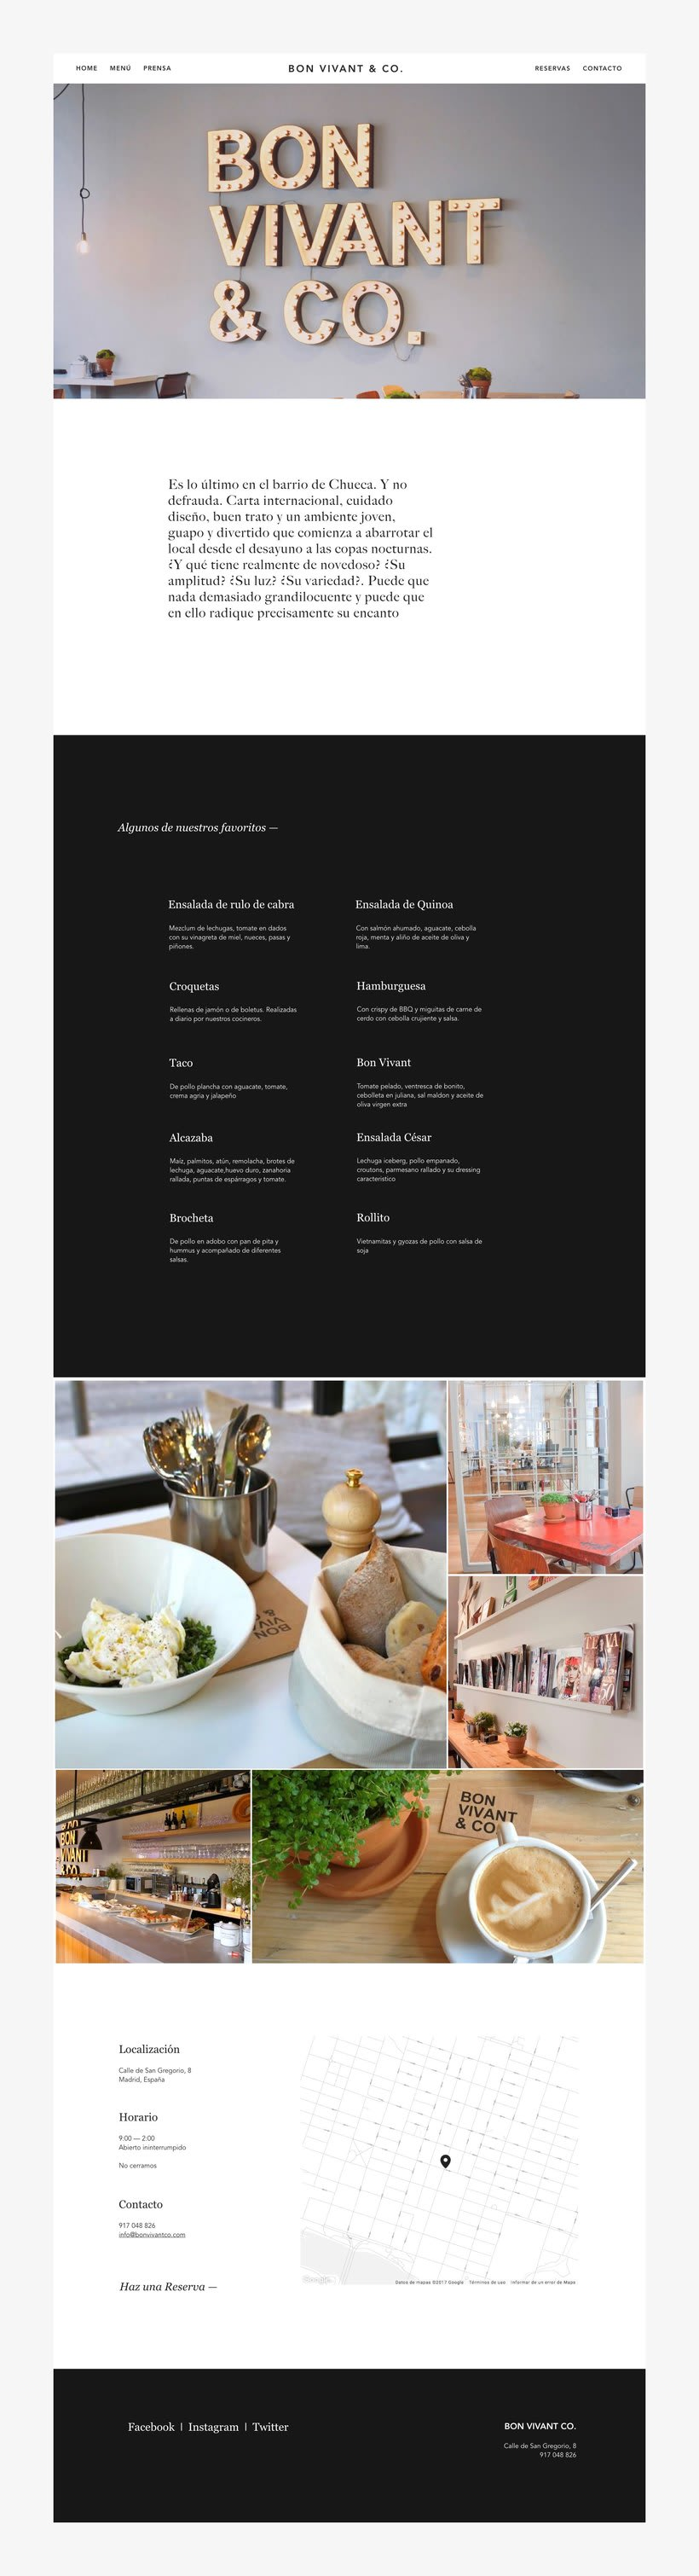 Bon Vivant & Co. Website 1